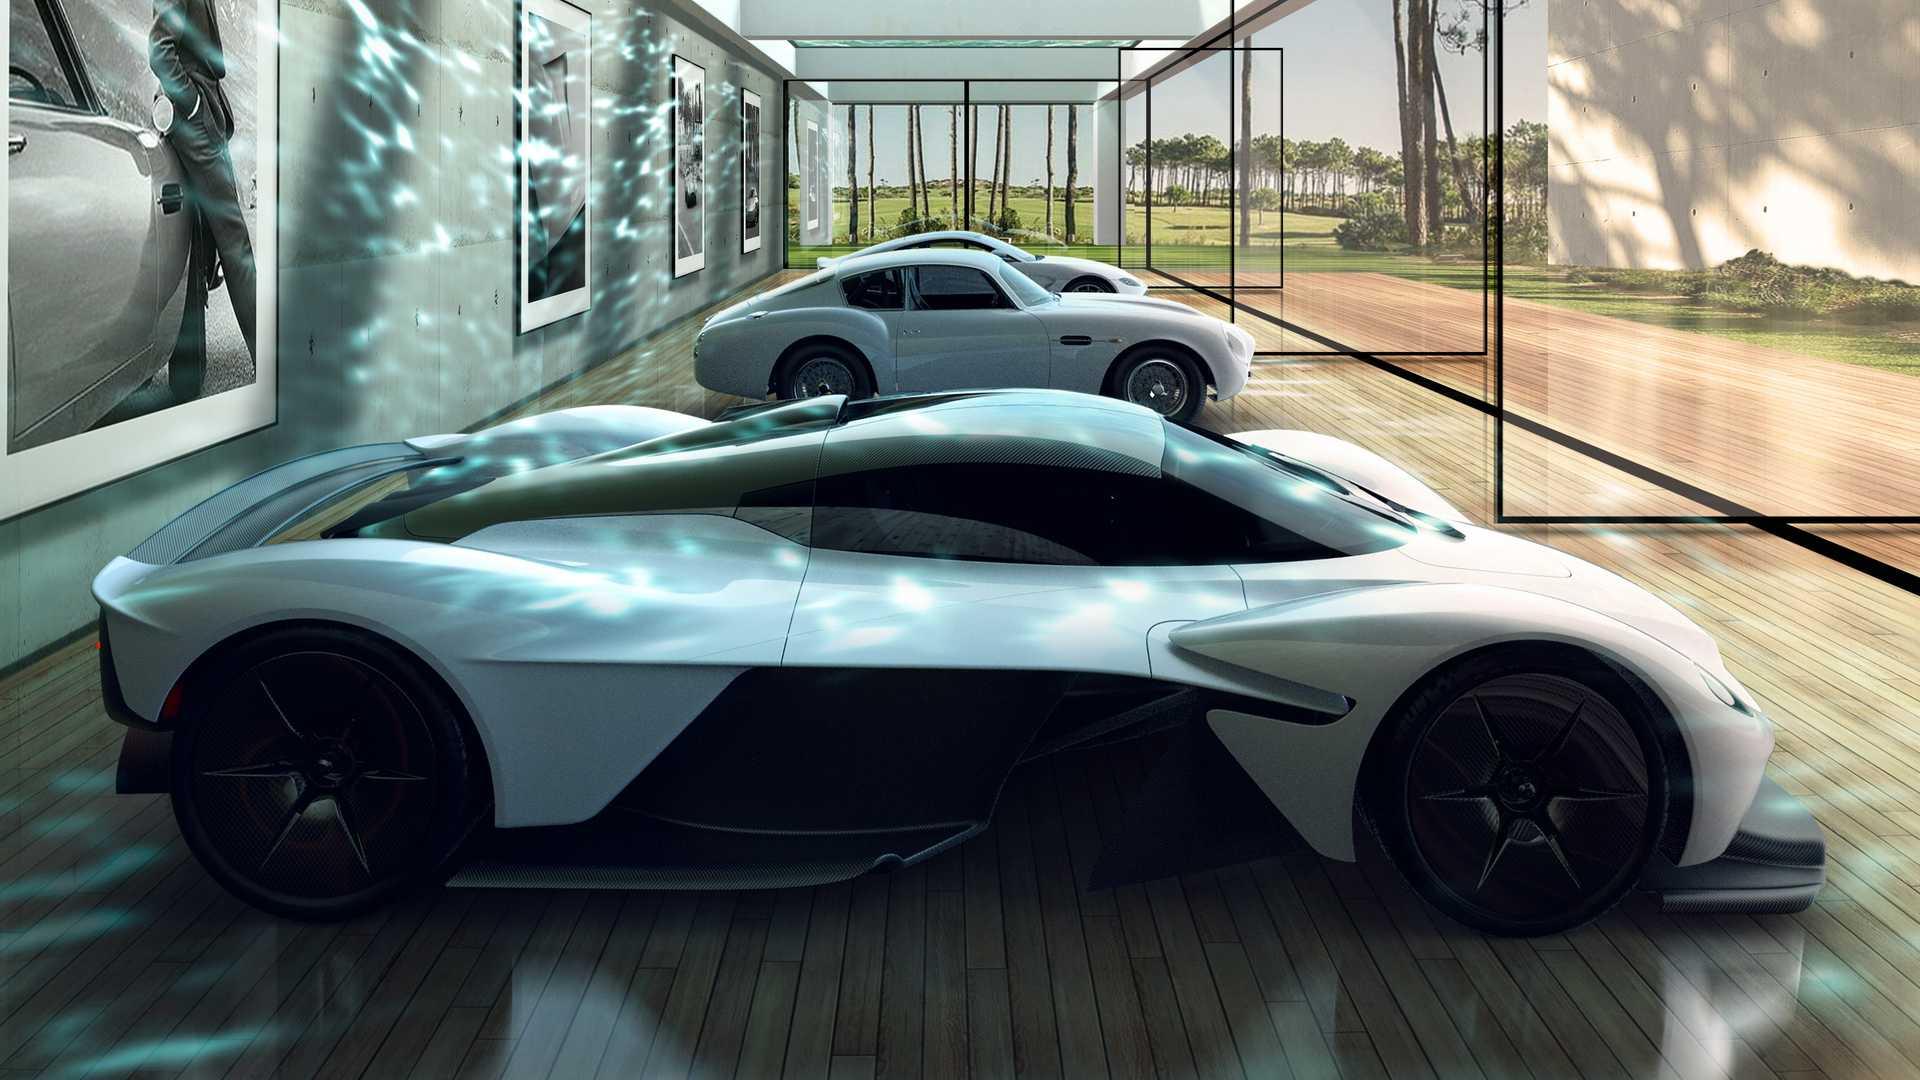 Aston Martin займётся строительством гаражей 2